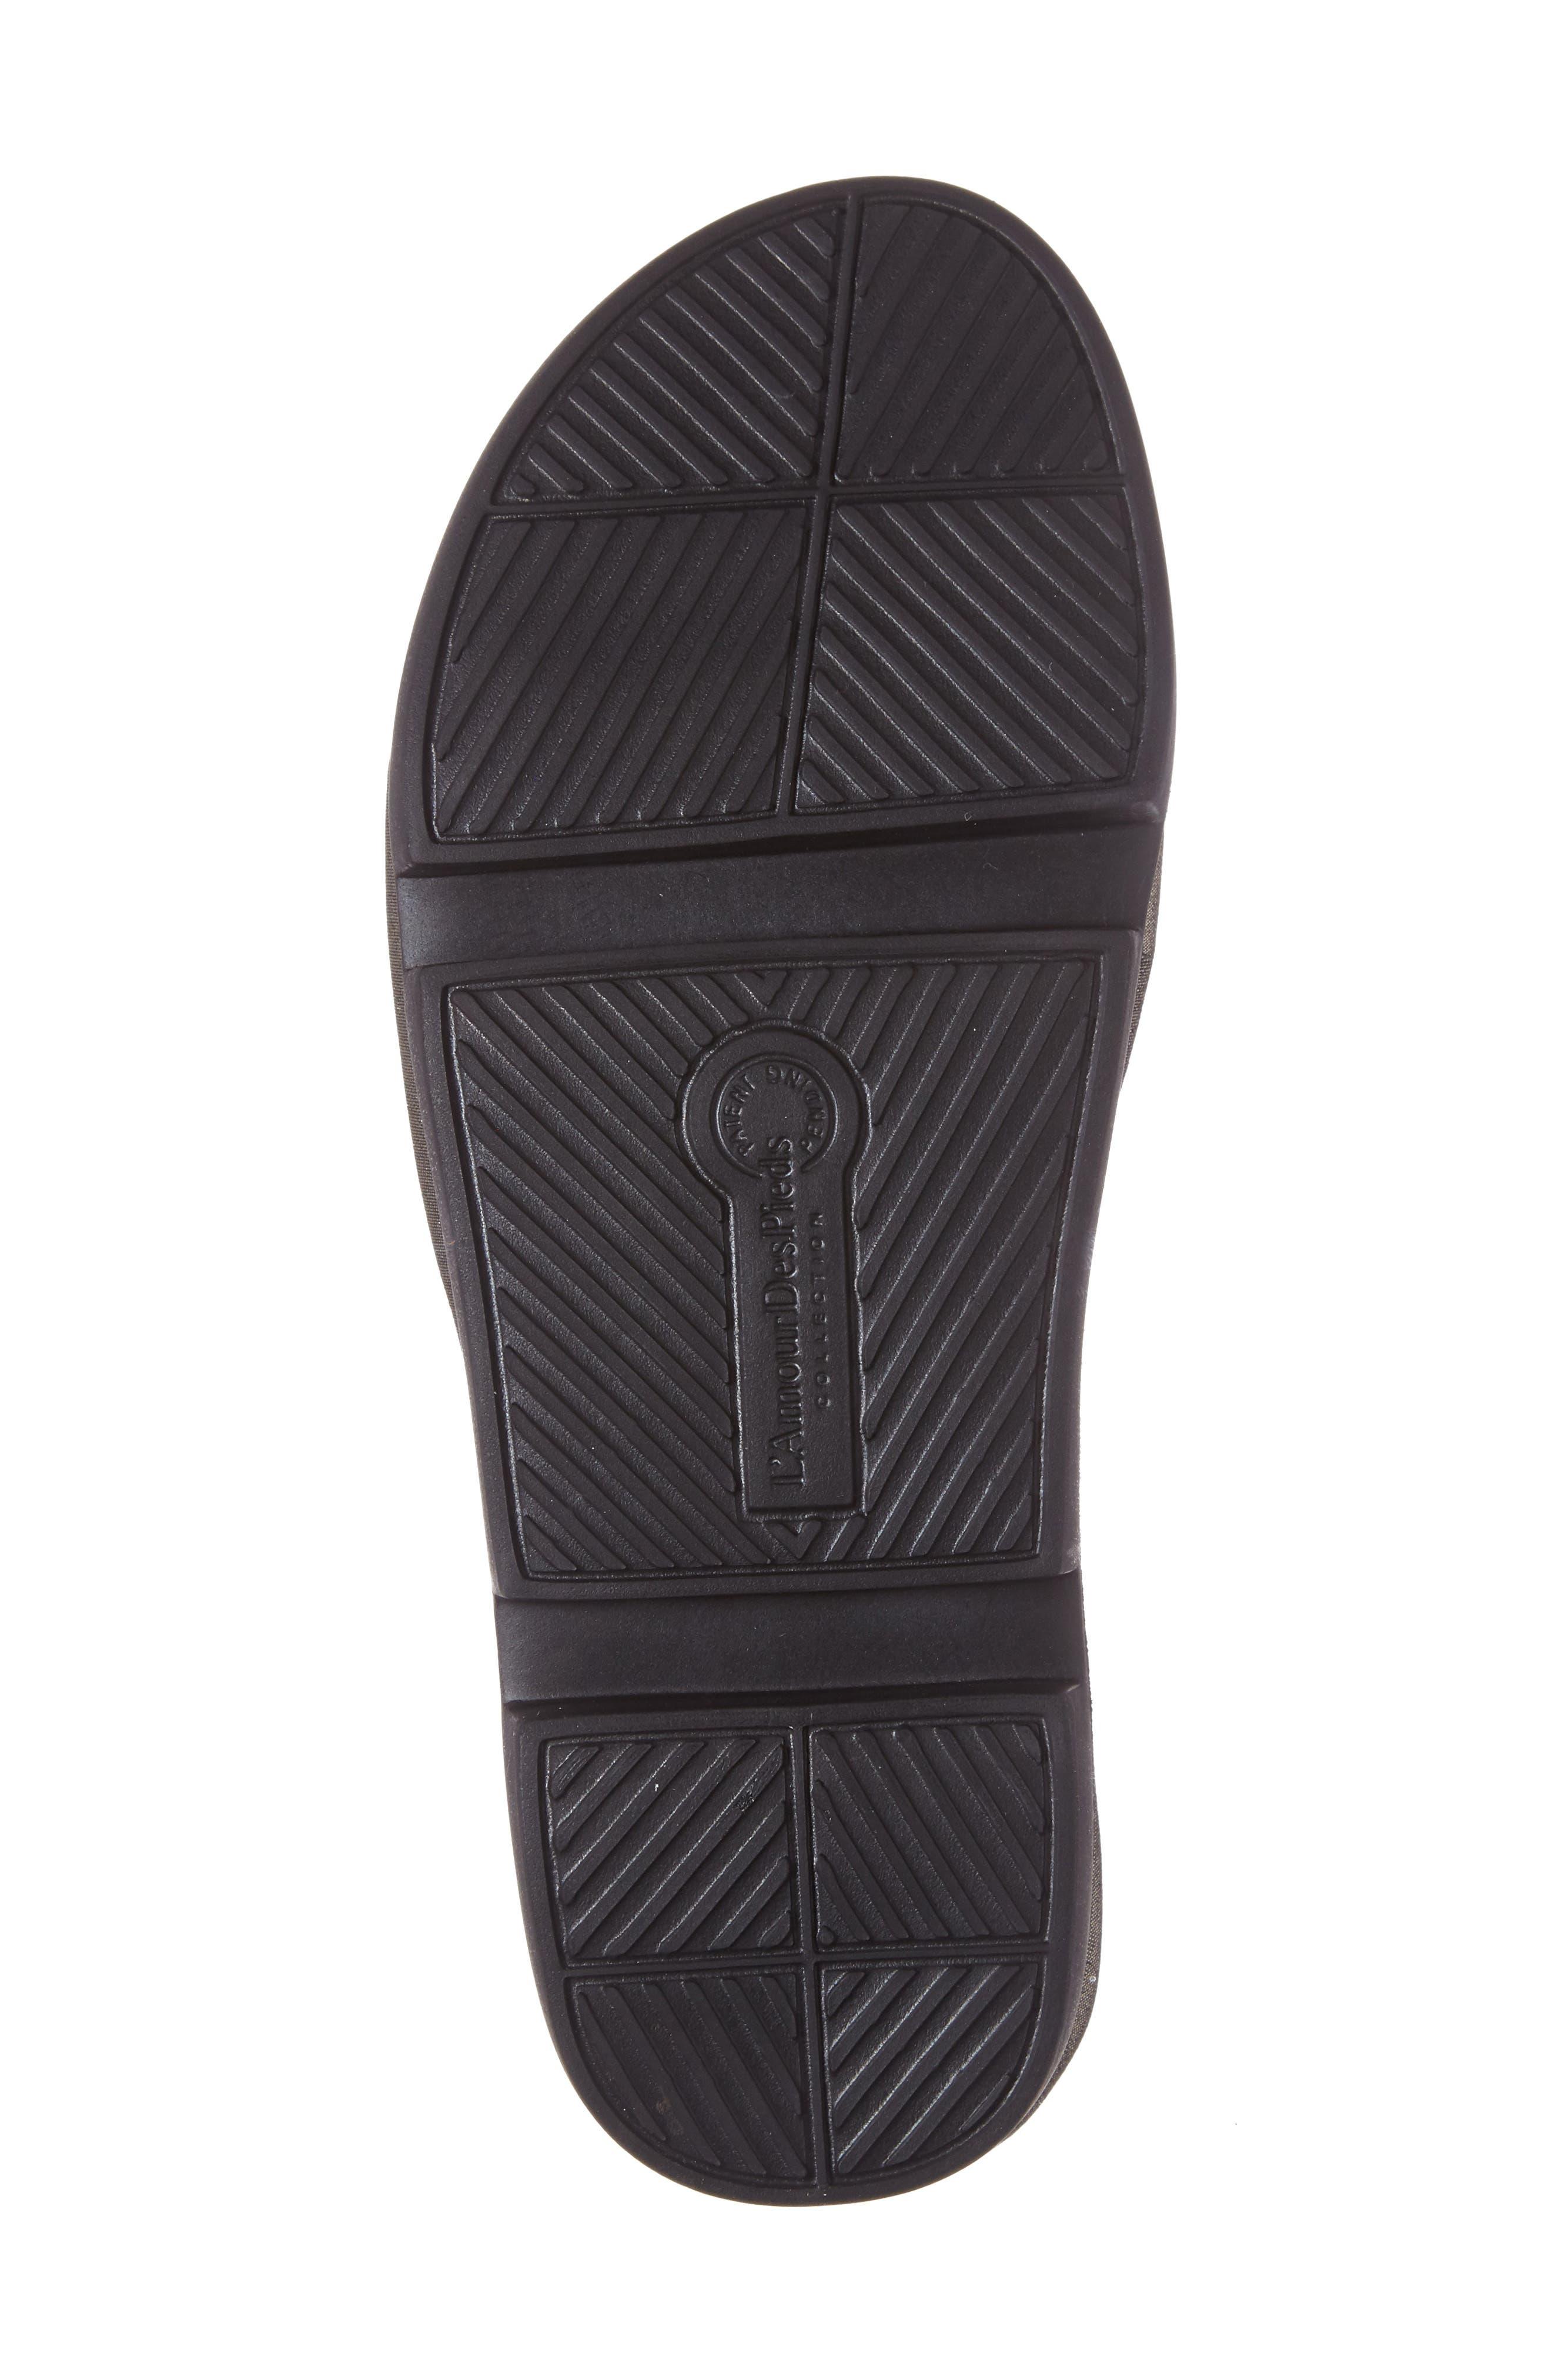 Viareggio Slide Sandal,                             Alternate thumbnail 4, color,                             BLACK ATHENA LEATHER